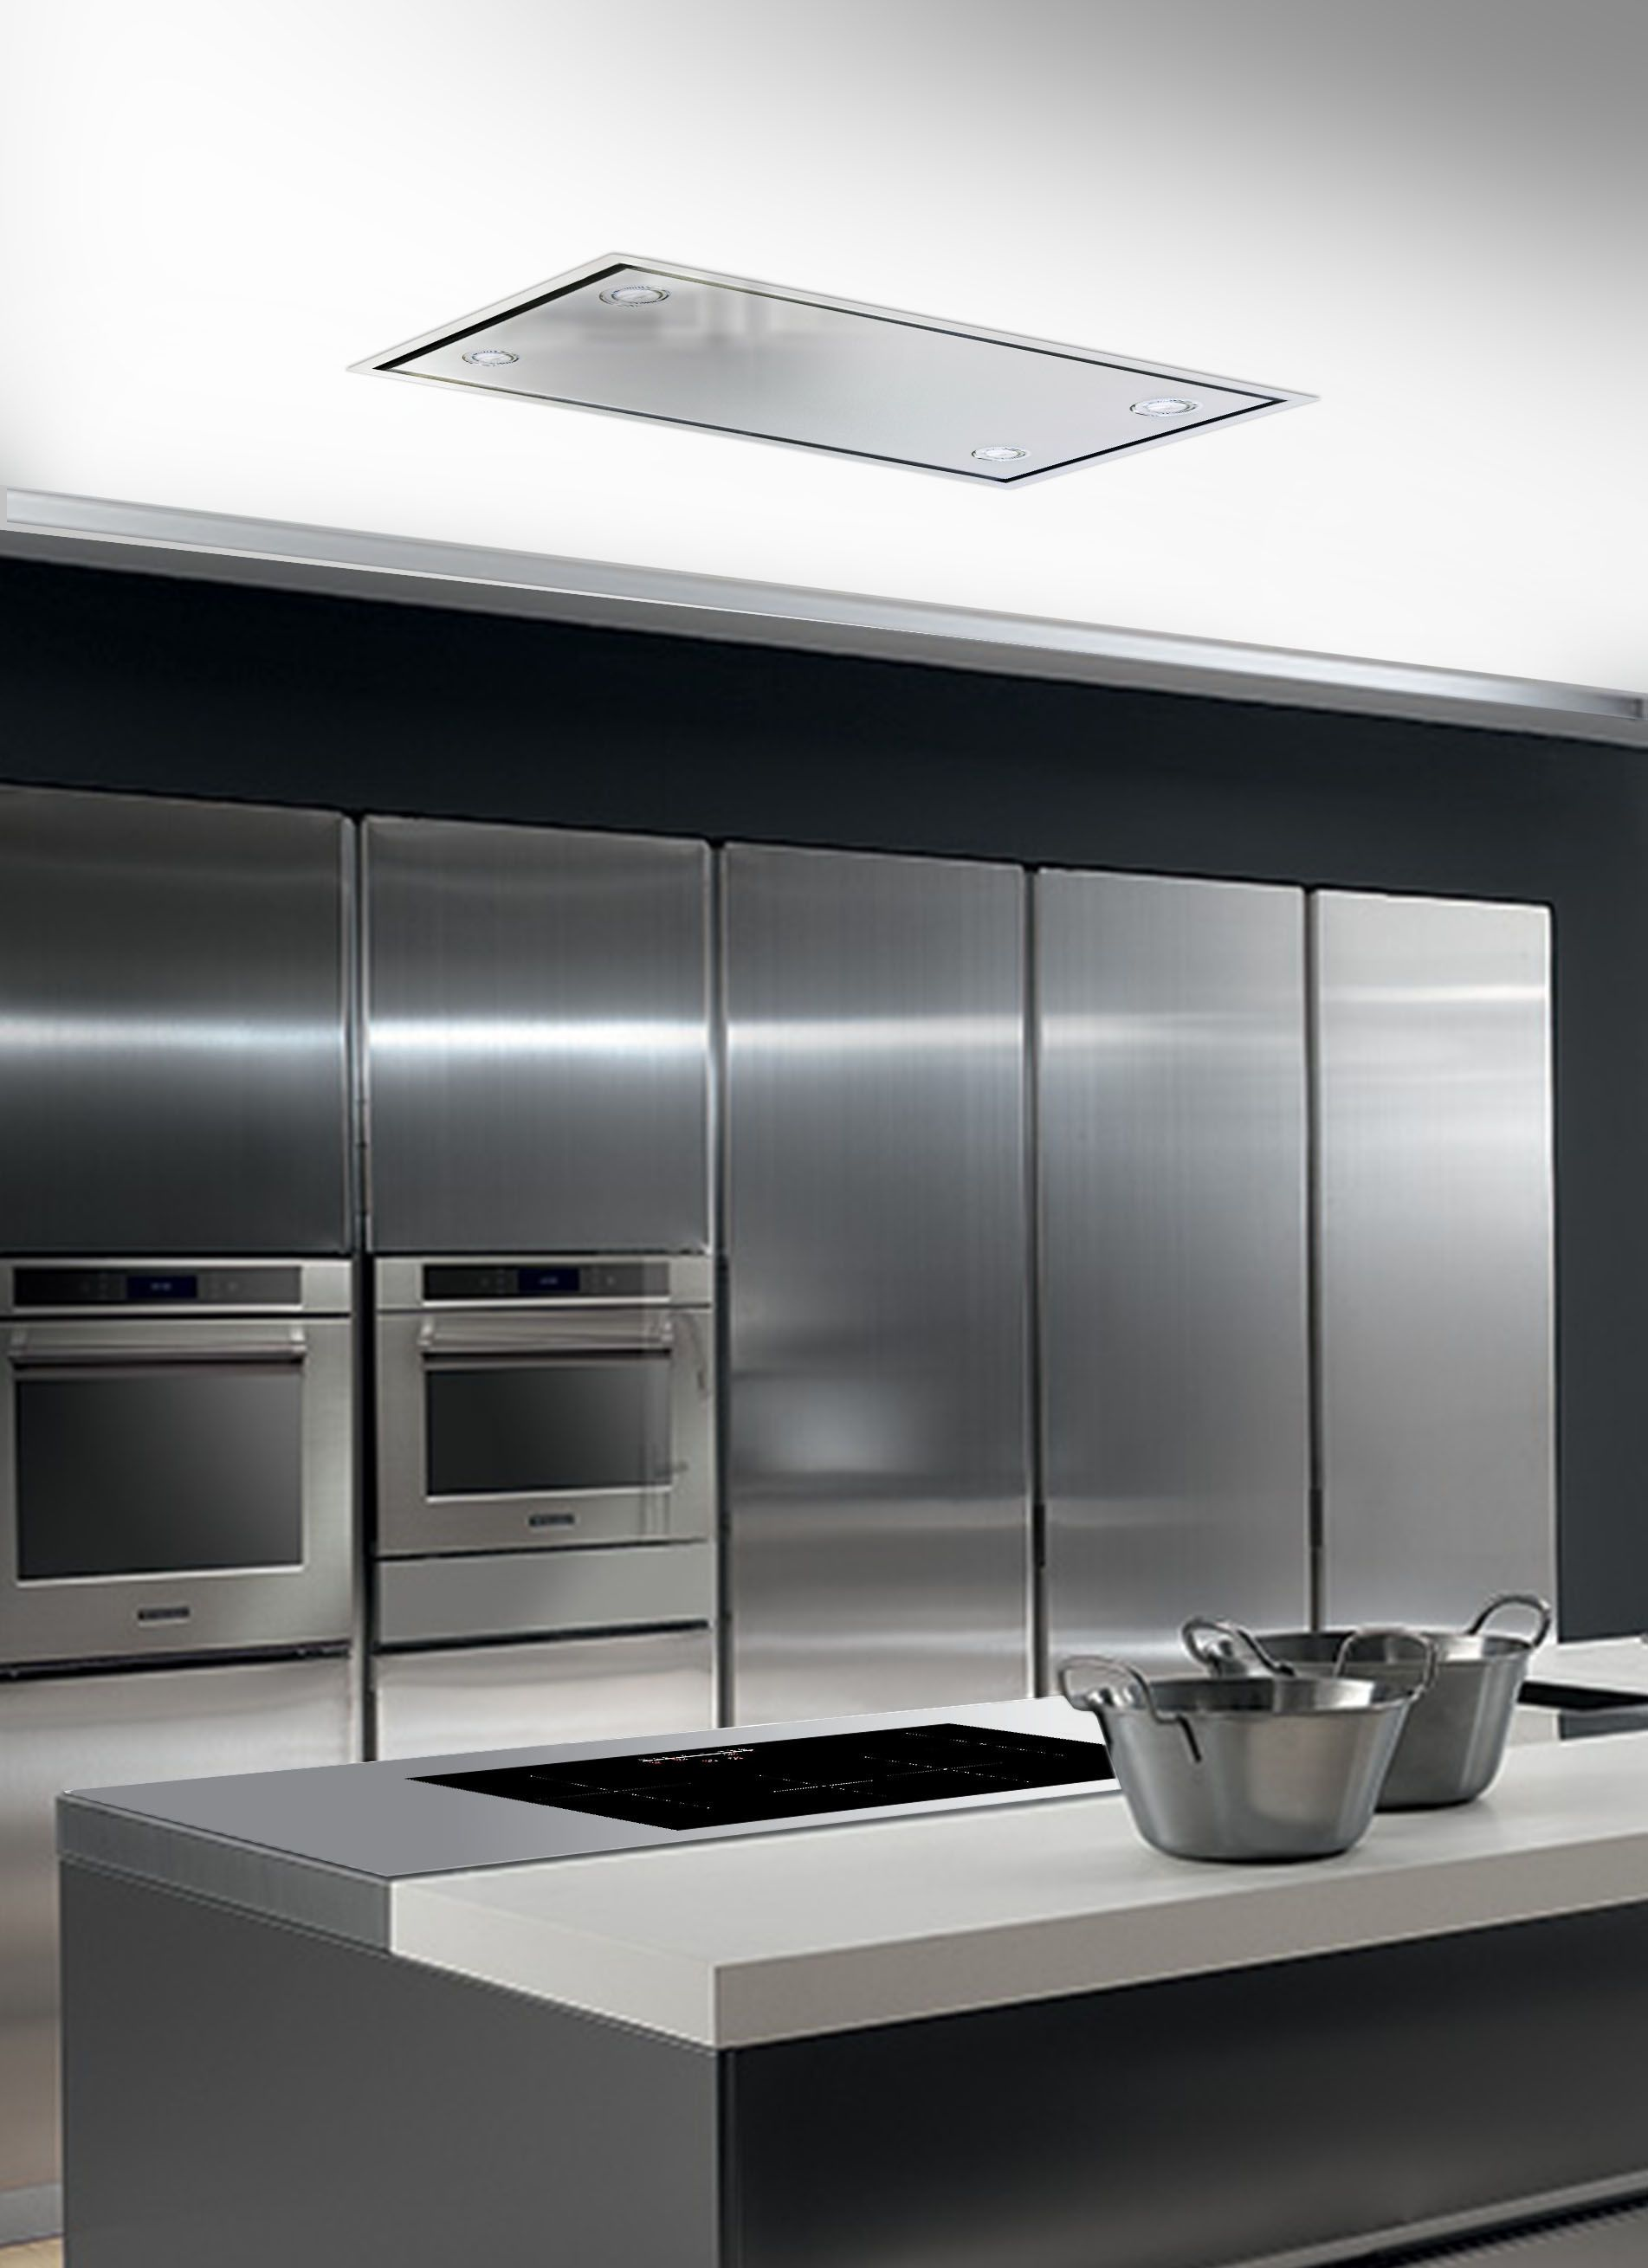 Skyline Ce120 Kitchen Ceiling Extractor Extractair Kitchen